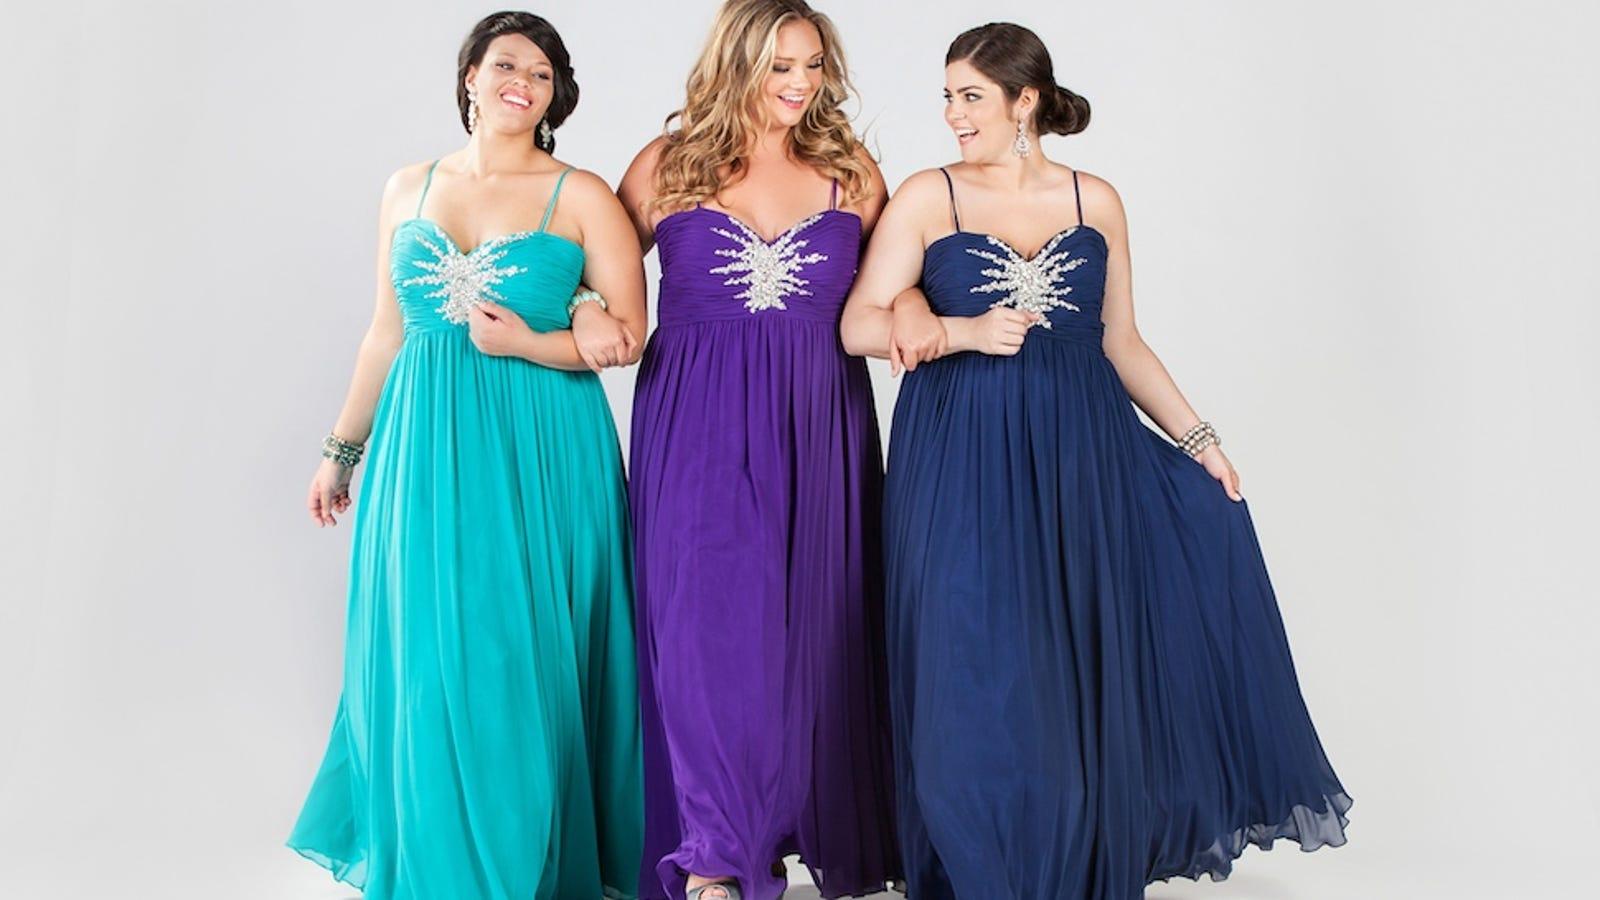 It Still Sucks To Shop For Plus-Size Prom Dresses